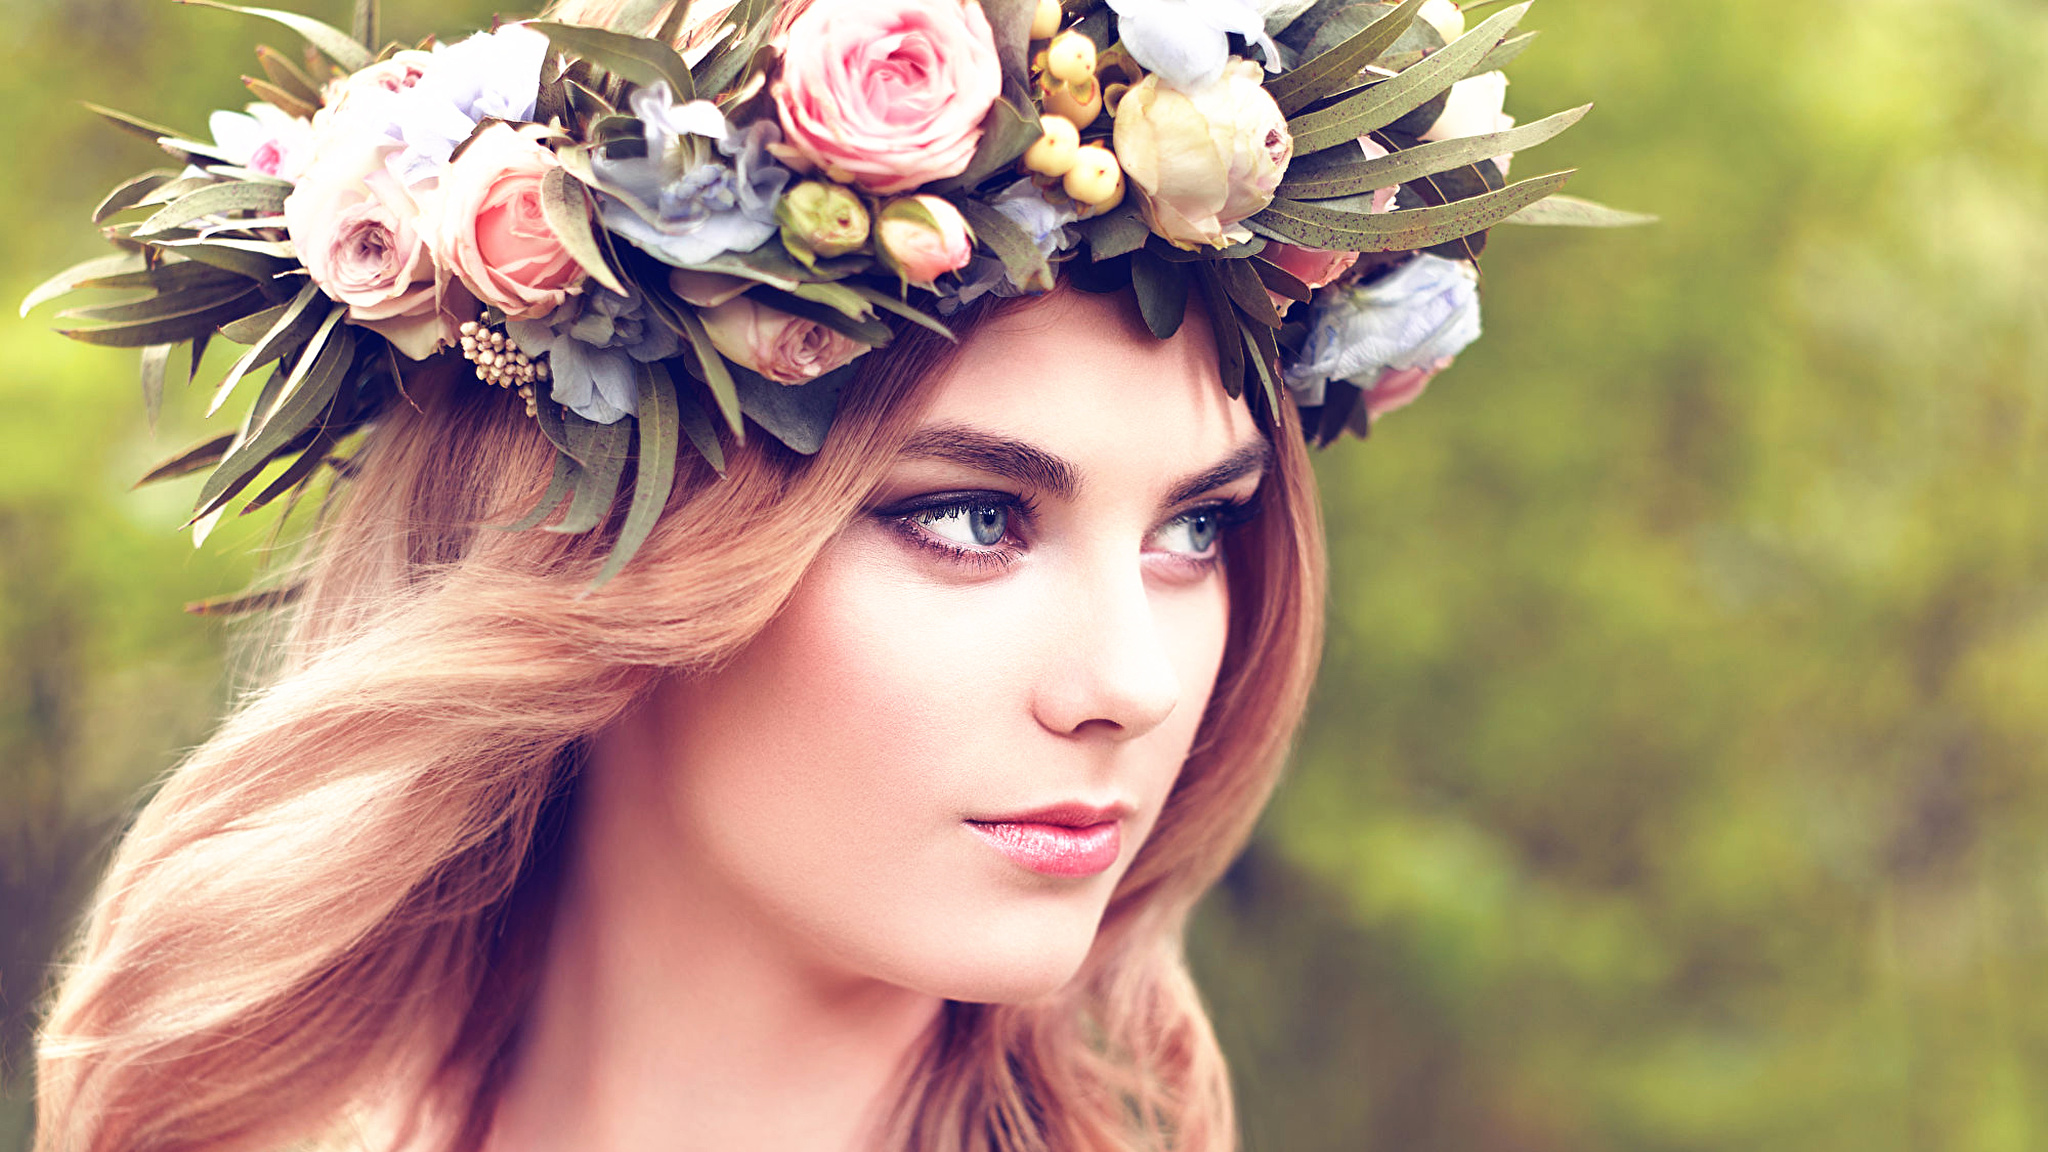 девушка венок цветы без регистрации